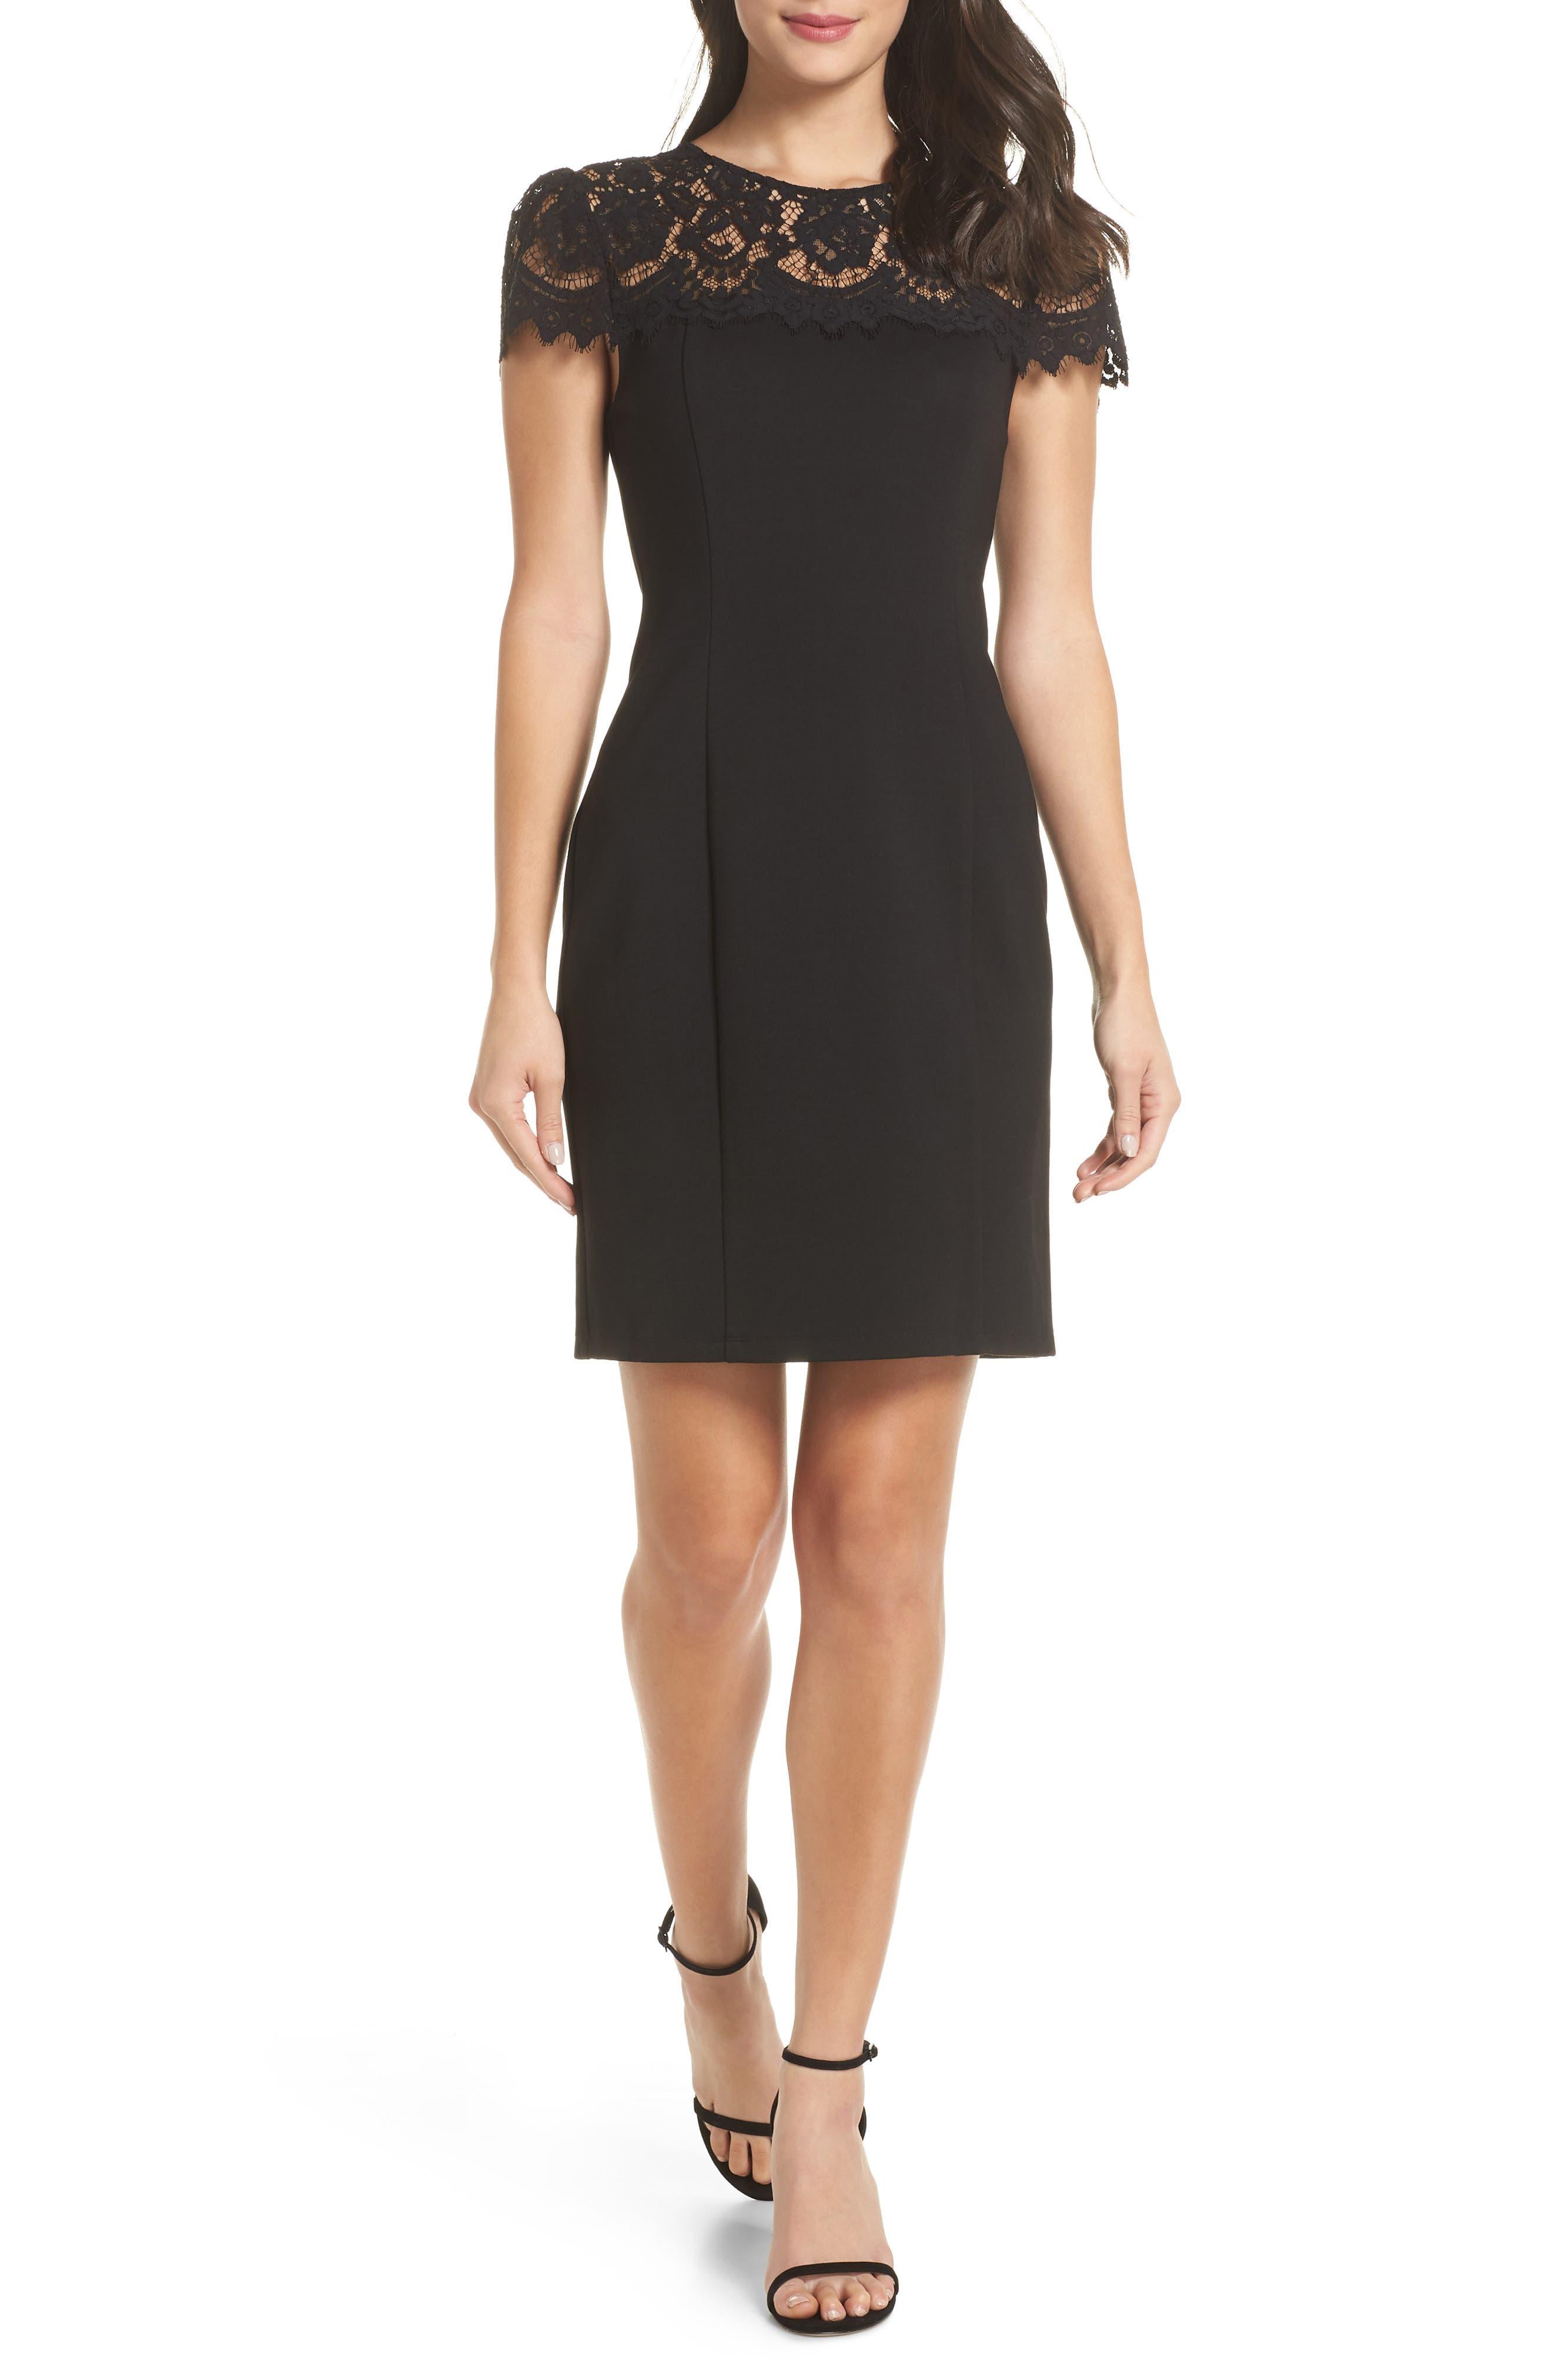 CHARLES HENRY Lace Yoke Sheath Dress, Main, color, 001